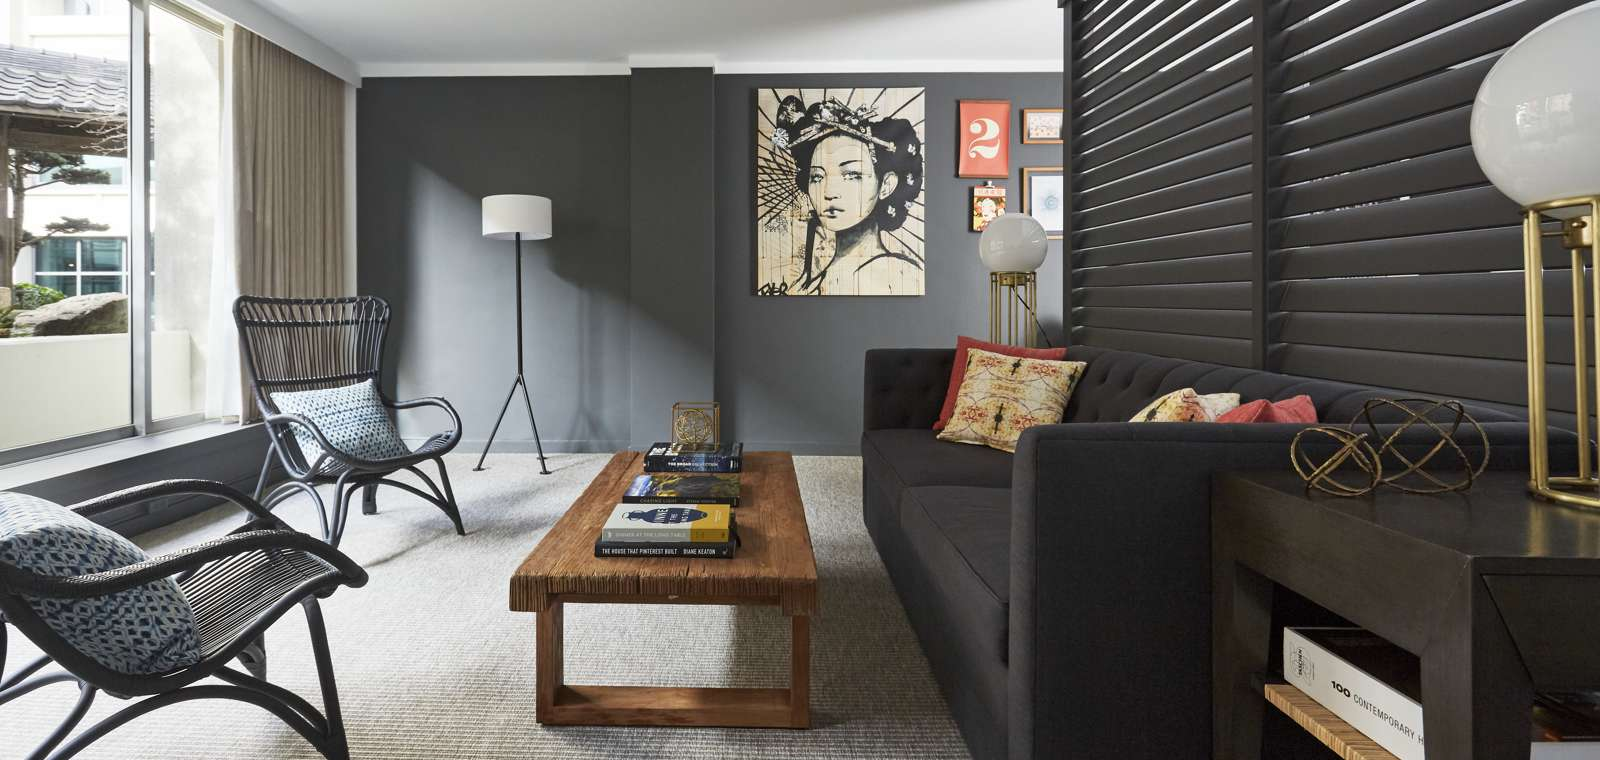 HotelKabuki_Rooms_Suite_Loft_LivingRoom